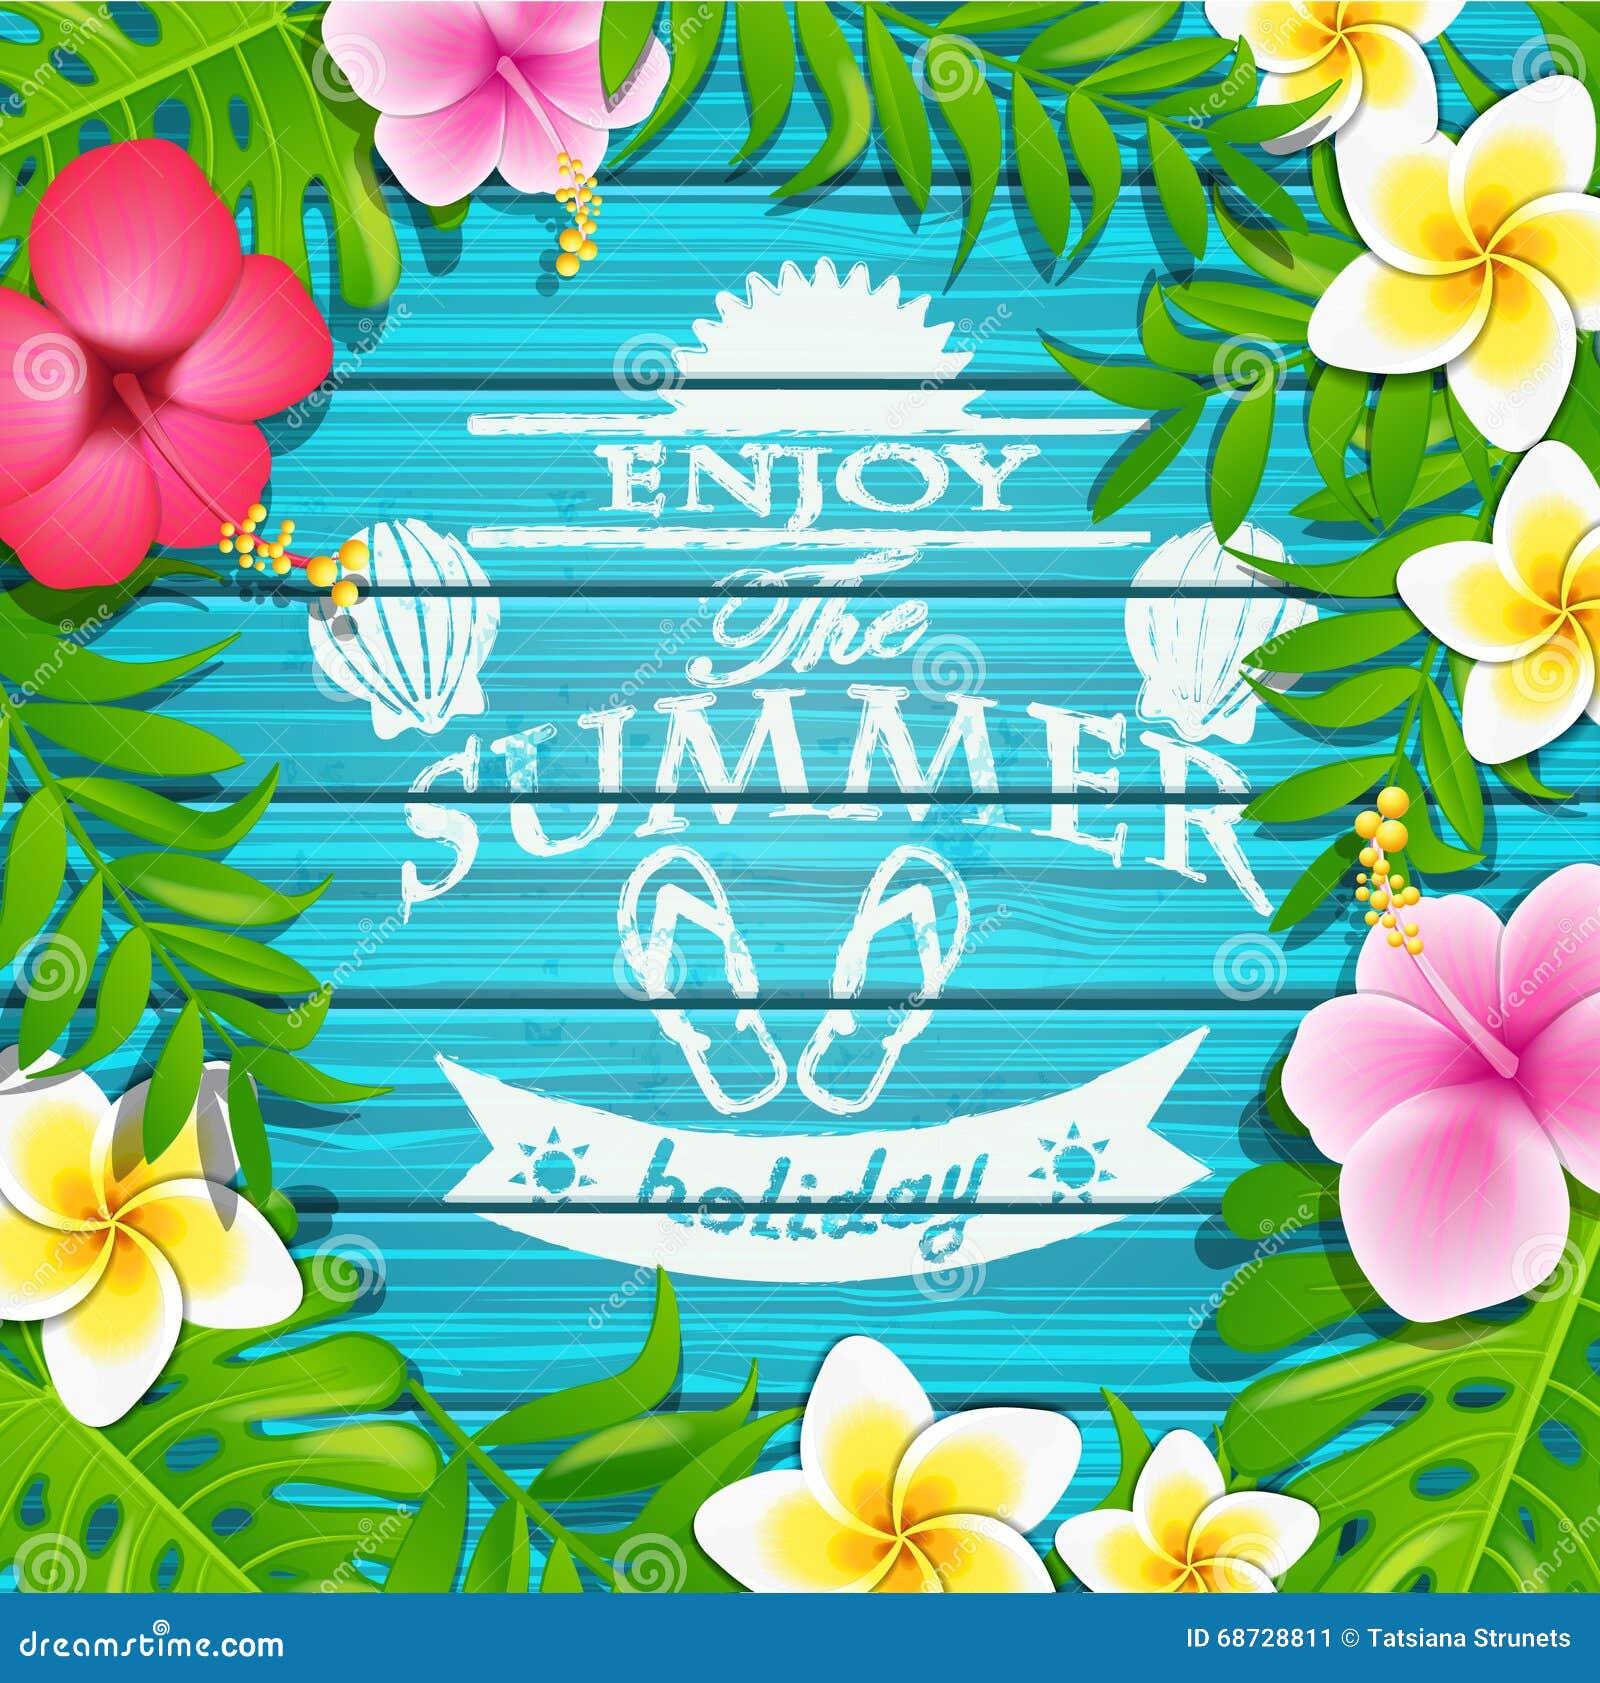 Couple Enjoying Their Summer Holidays Stock Photo: Enjoy The Summer Holiday. Stock Illustration. Illustration